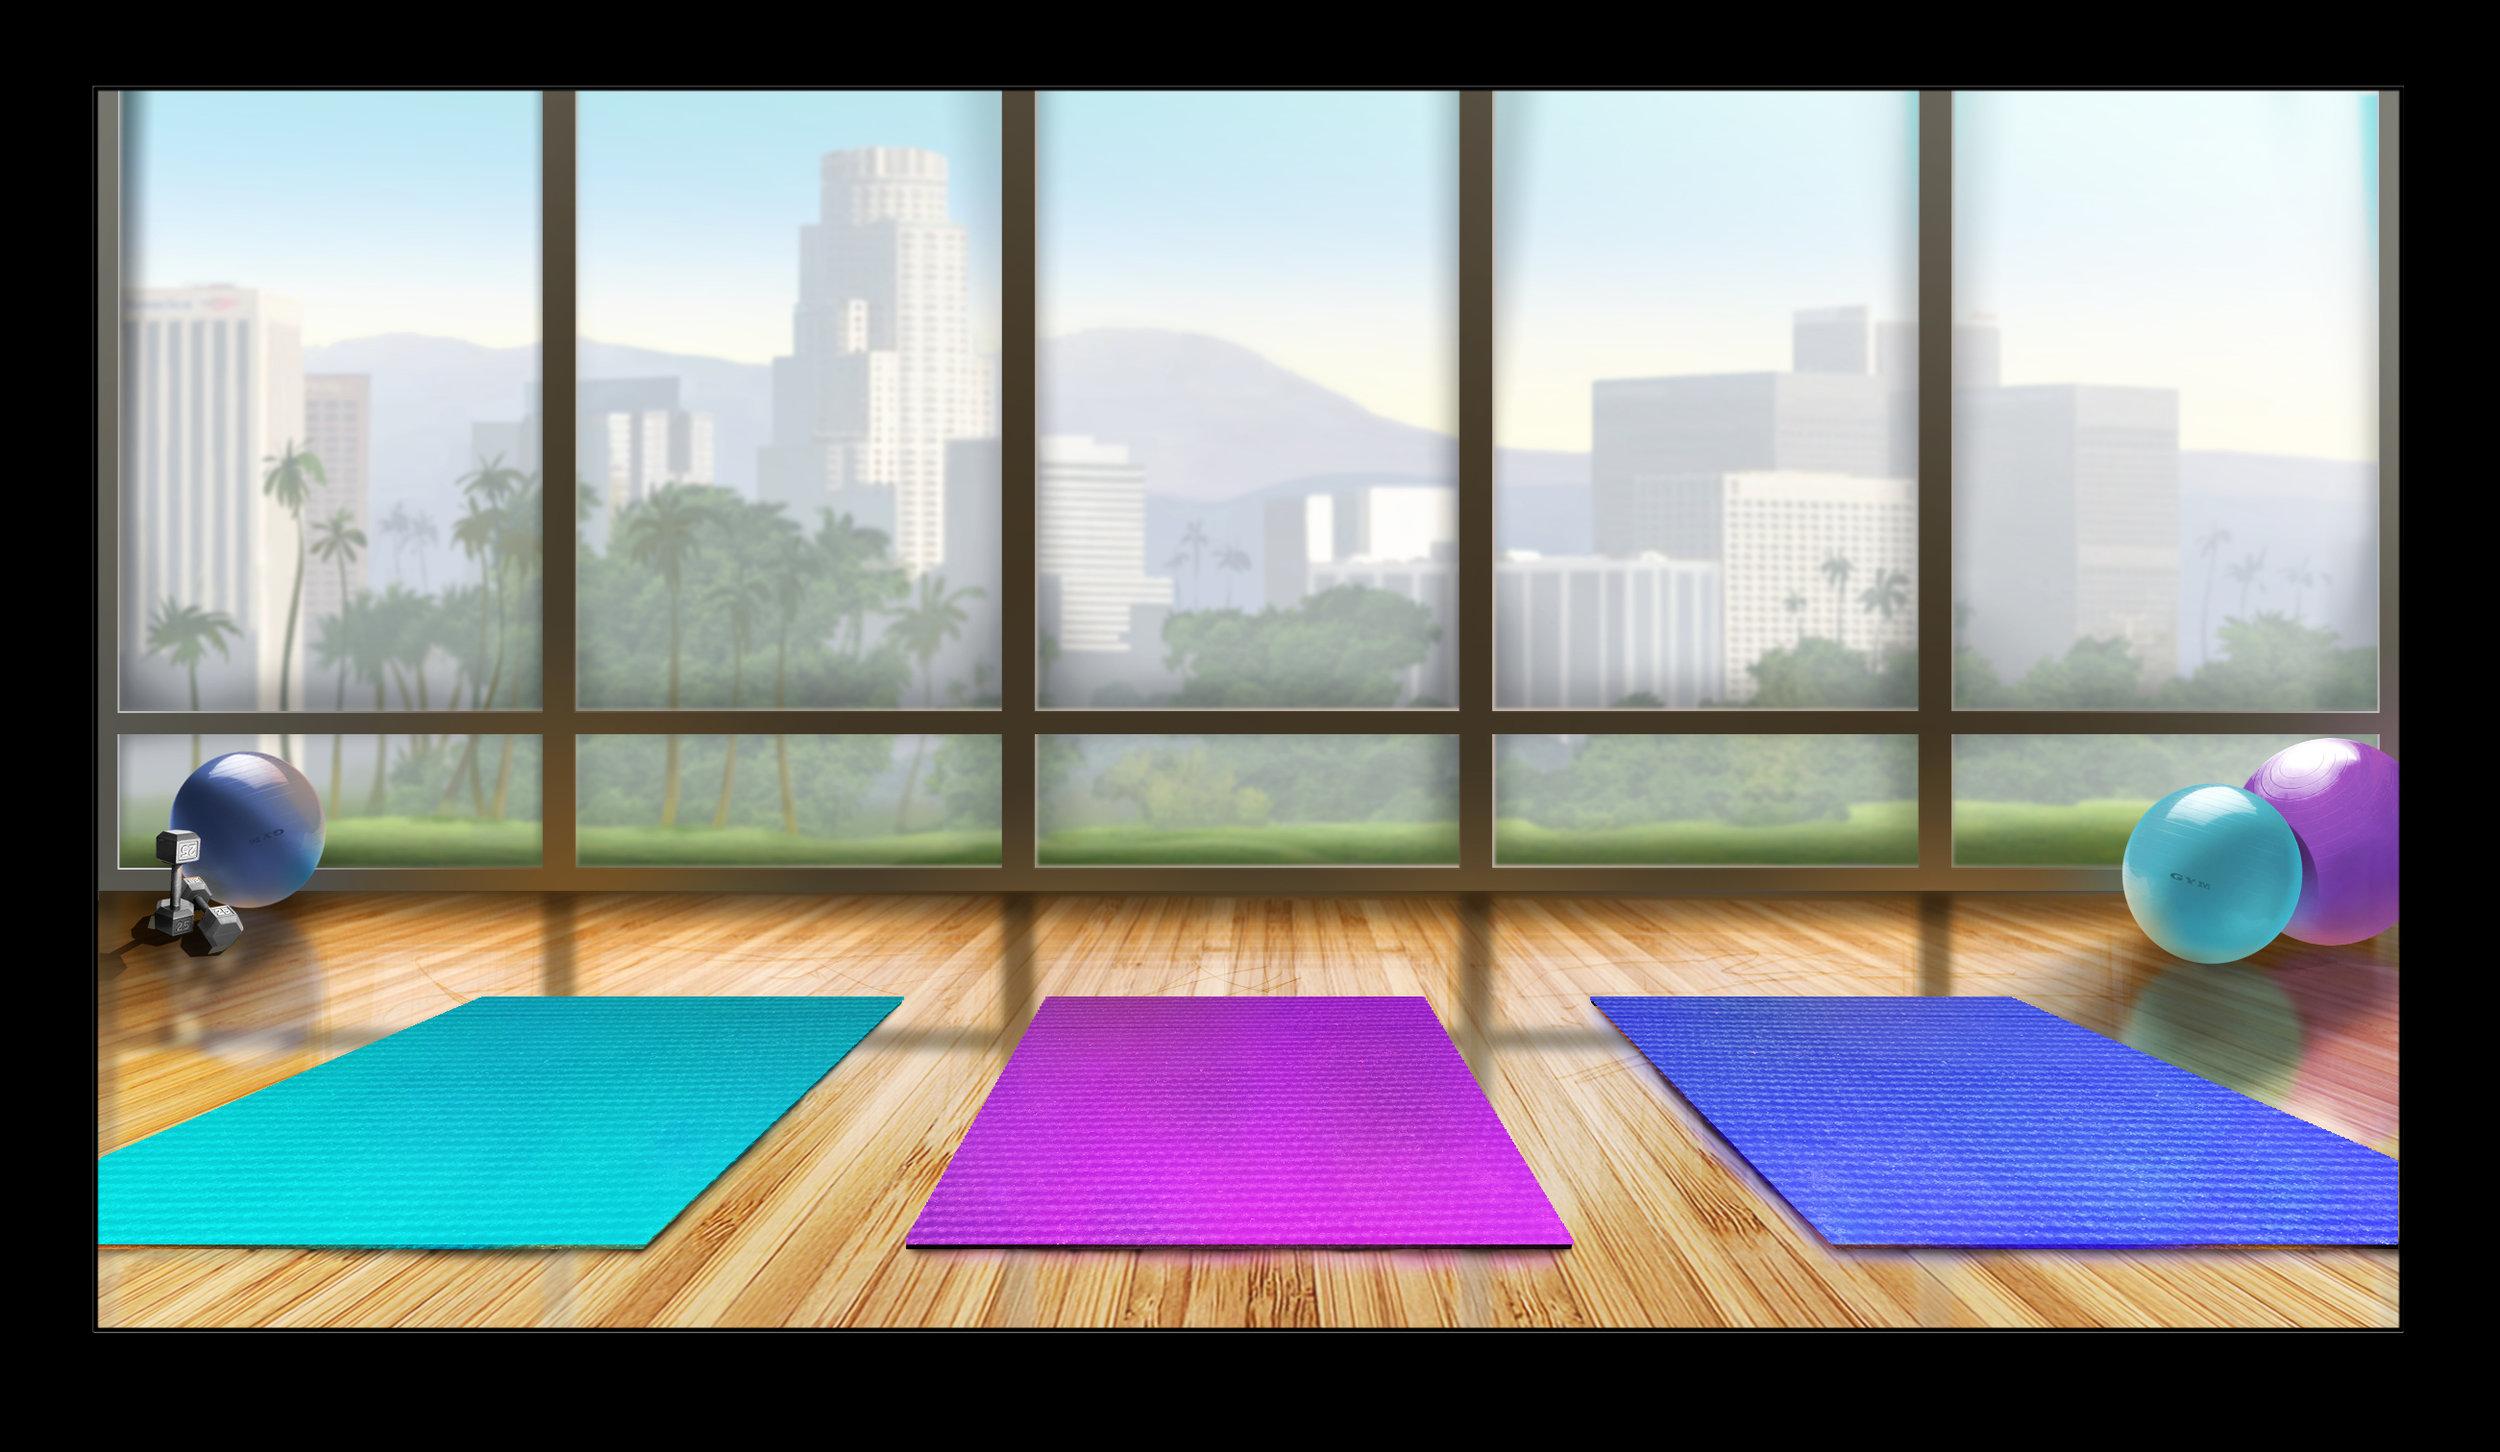 workout_room_lighting2.jpg